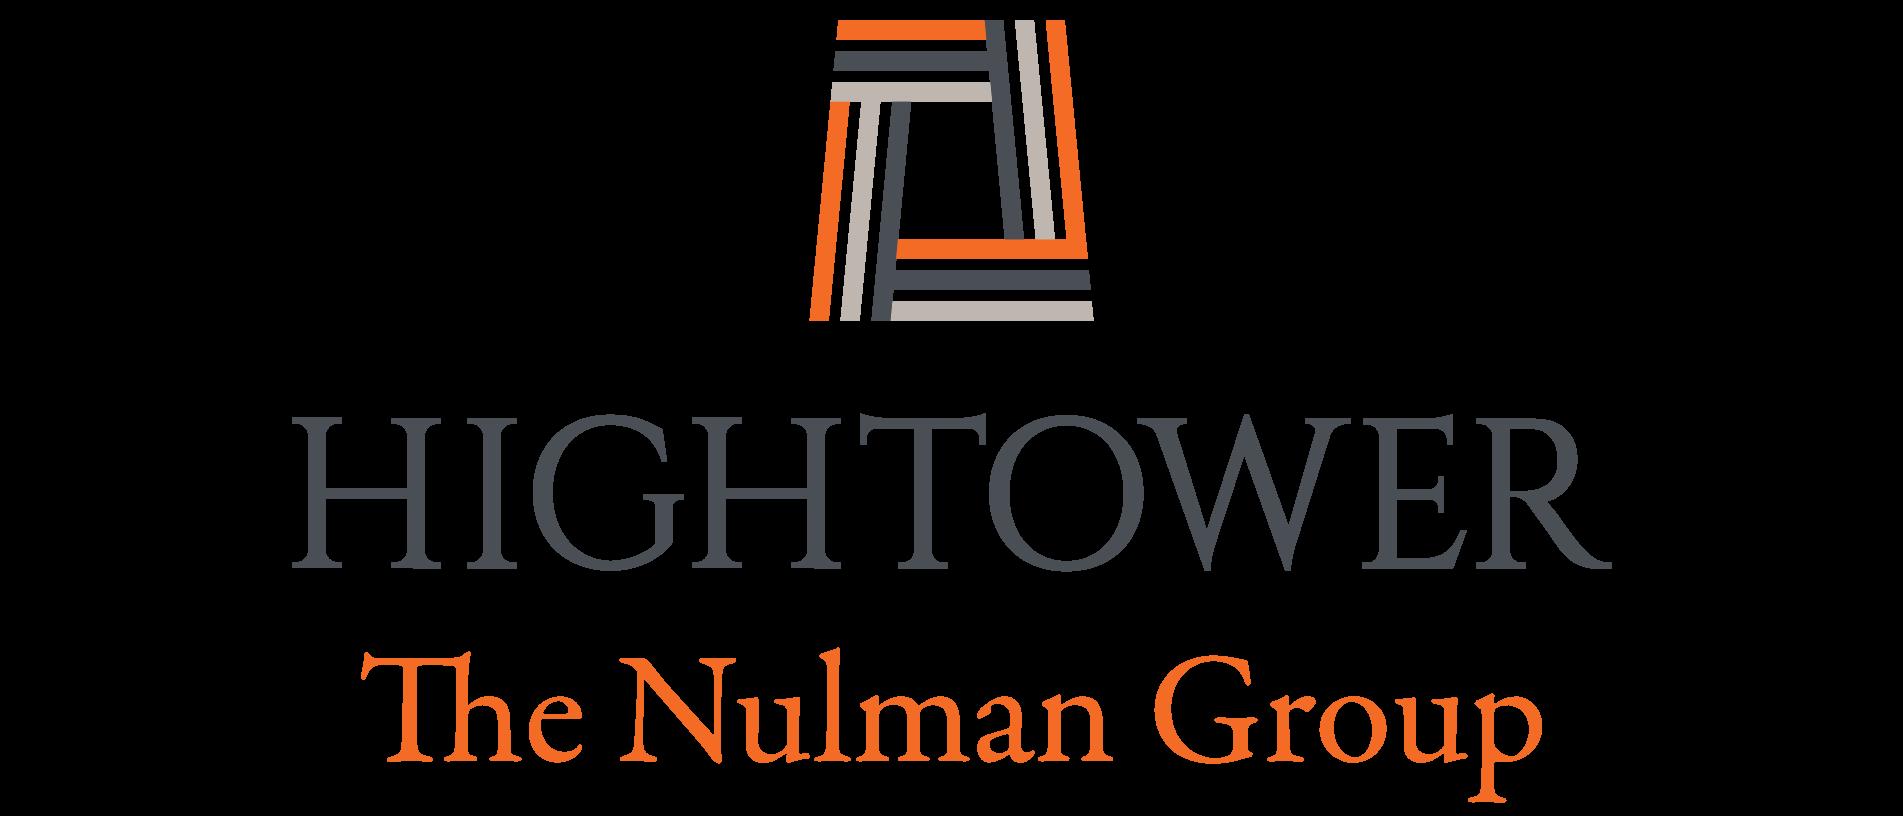 The Nulman Group Logo